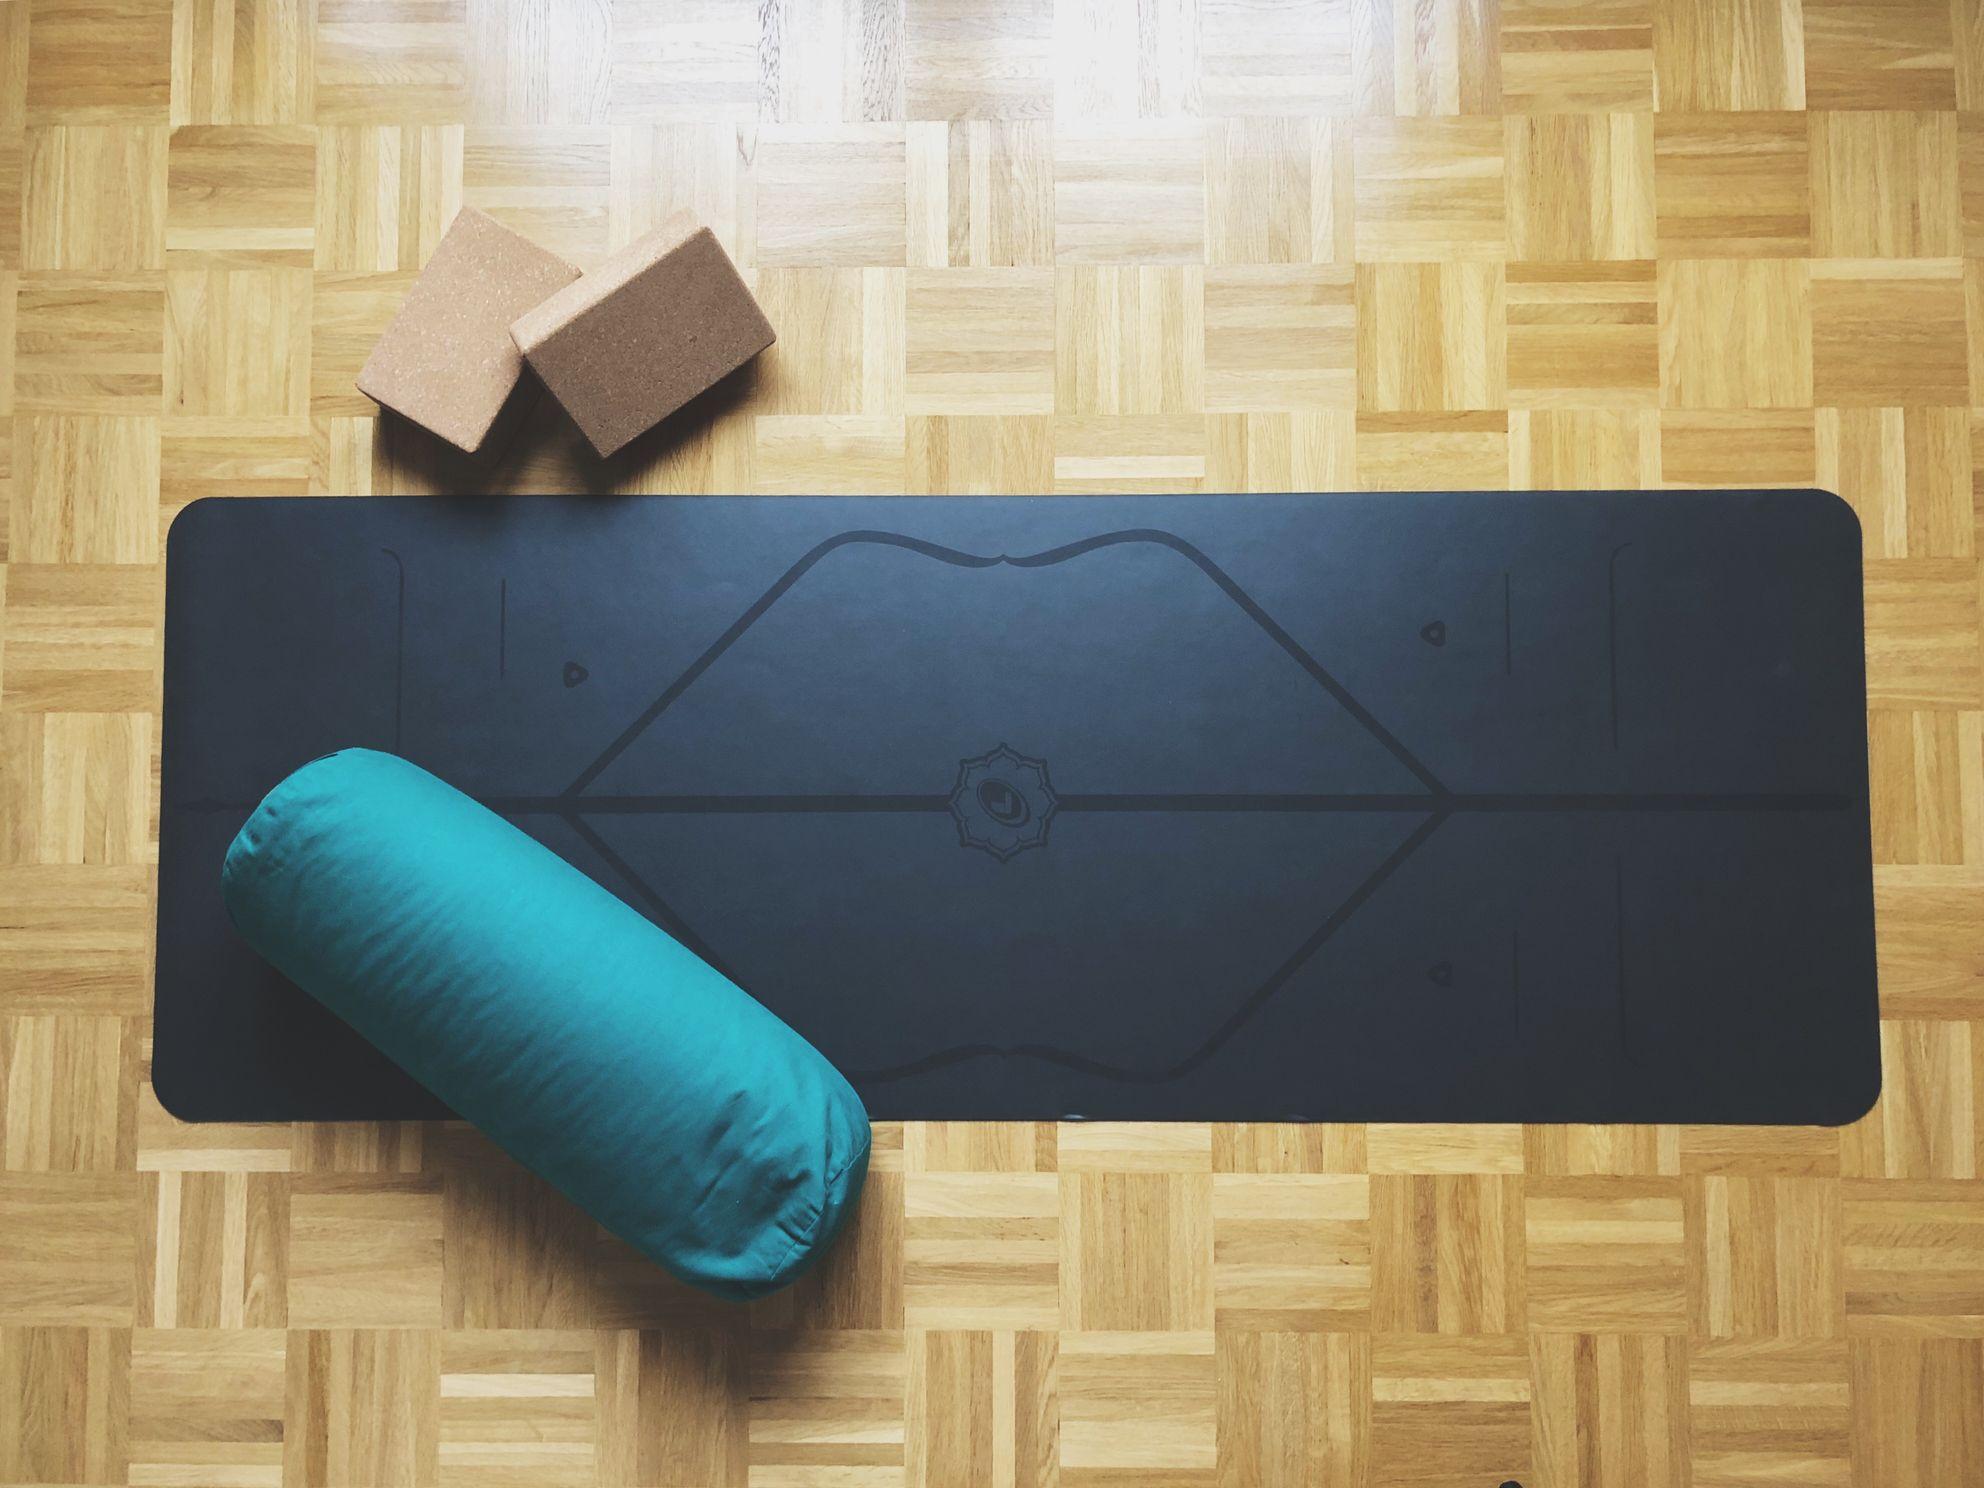 Yoga_Routine_Alltag_Yogamatte_Yogablock_Yogazubehör_Oh_Yes_Yoga